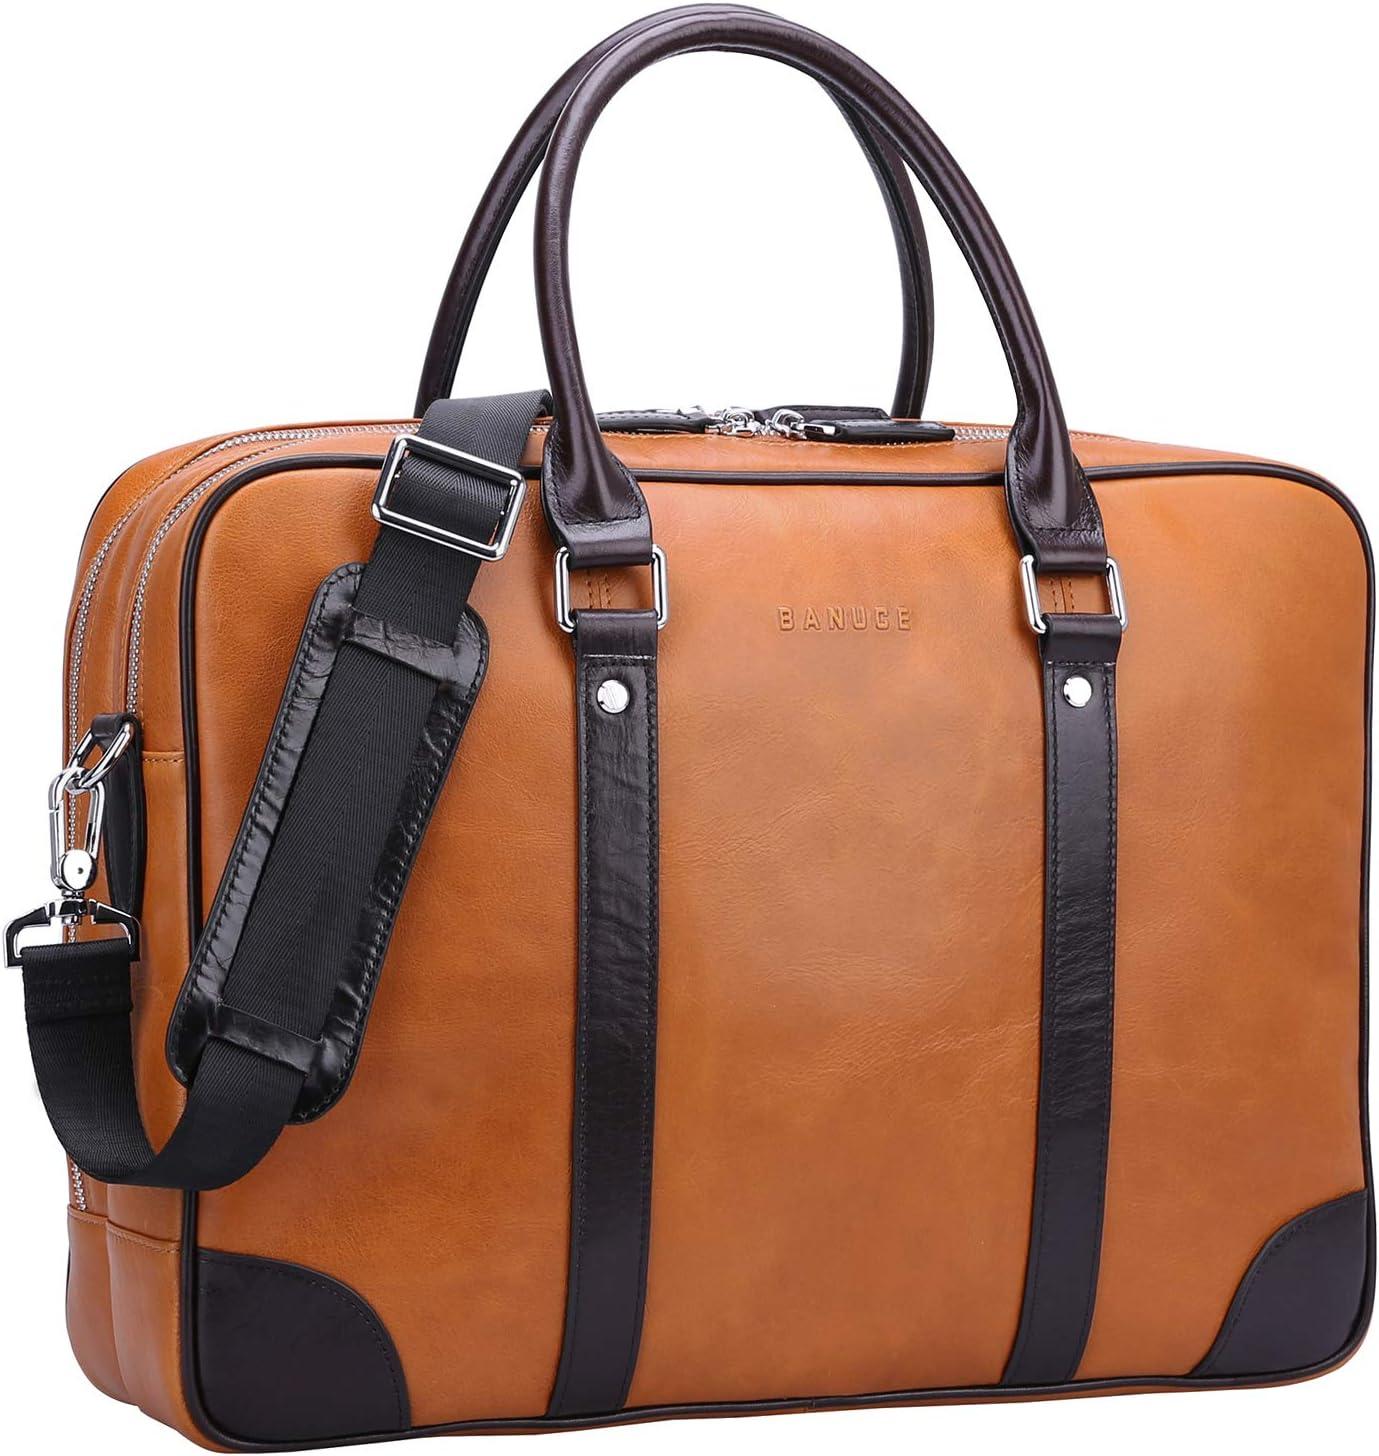 Banuce Full Grains Oil-Waxed Leather Briefcase for Men 14 inch Laptop Bag Attache Case Business Tote Handbags Shoulder Messenger Bag